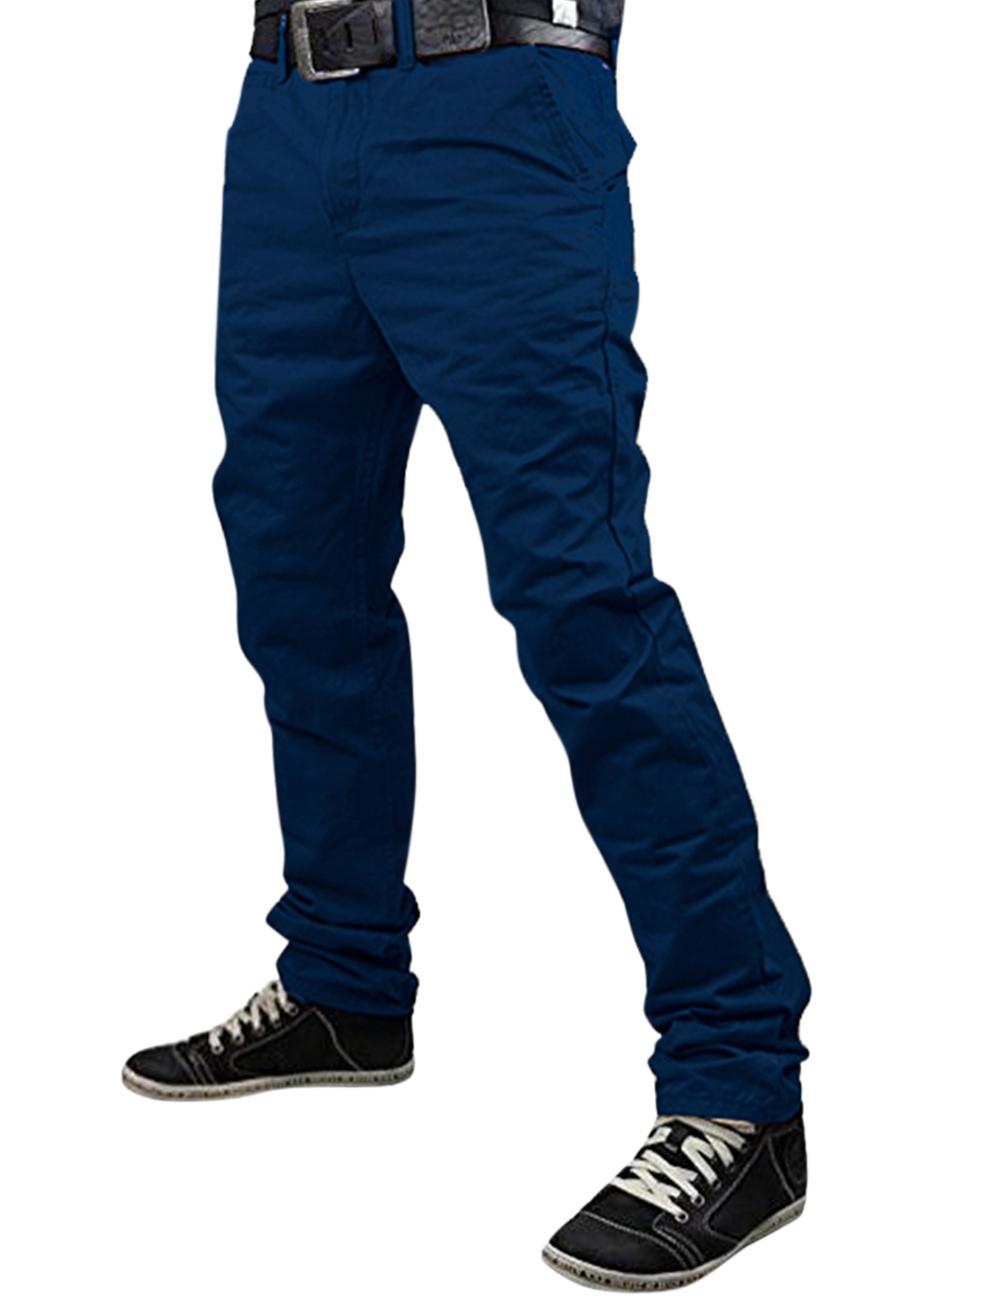 Fashionable Men Solid Color Trousers Business Straight-leg Pants Casual Cotton Pants Navy Blue_2XL